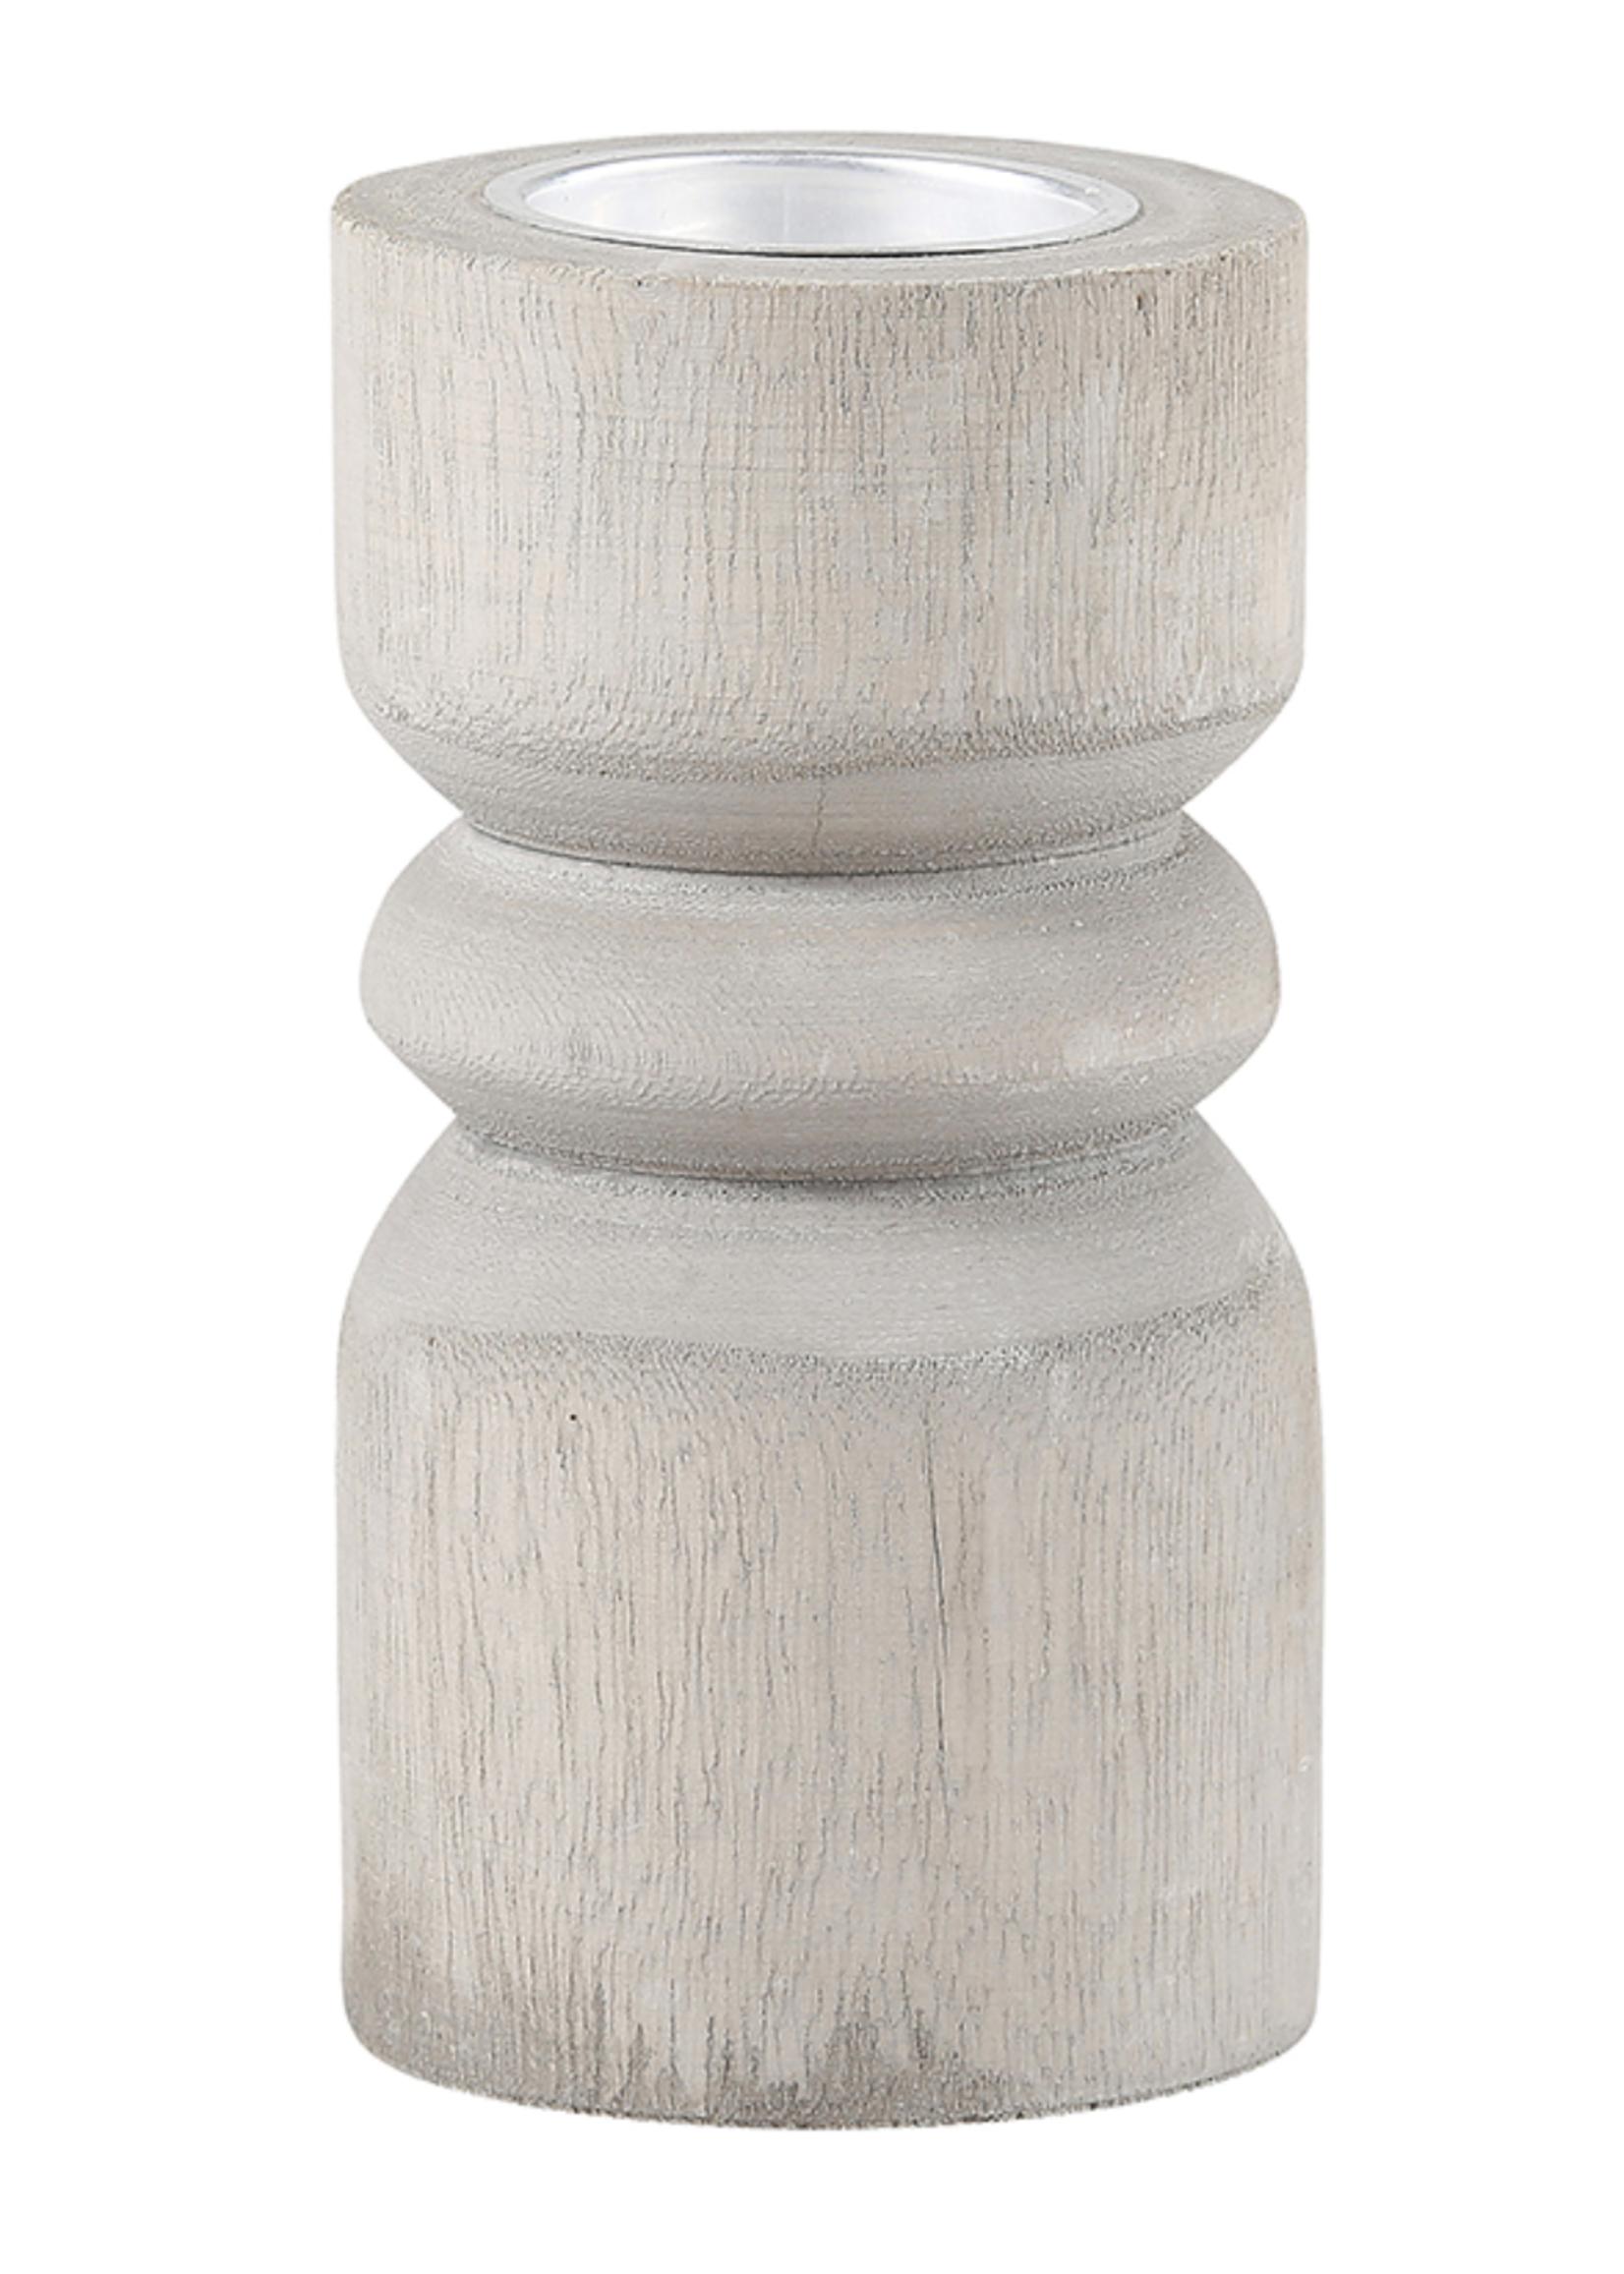 SB Design Studio Paulownia Candle Pillar